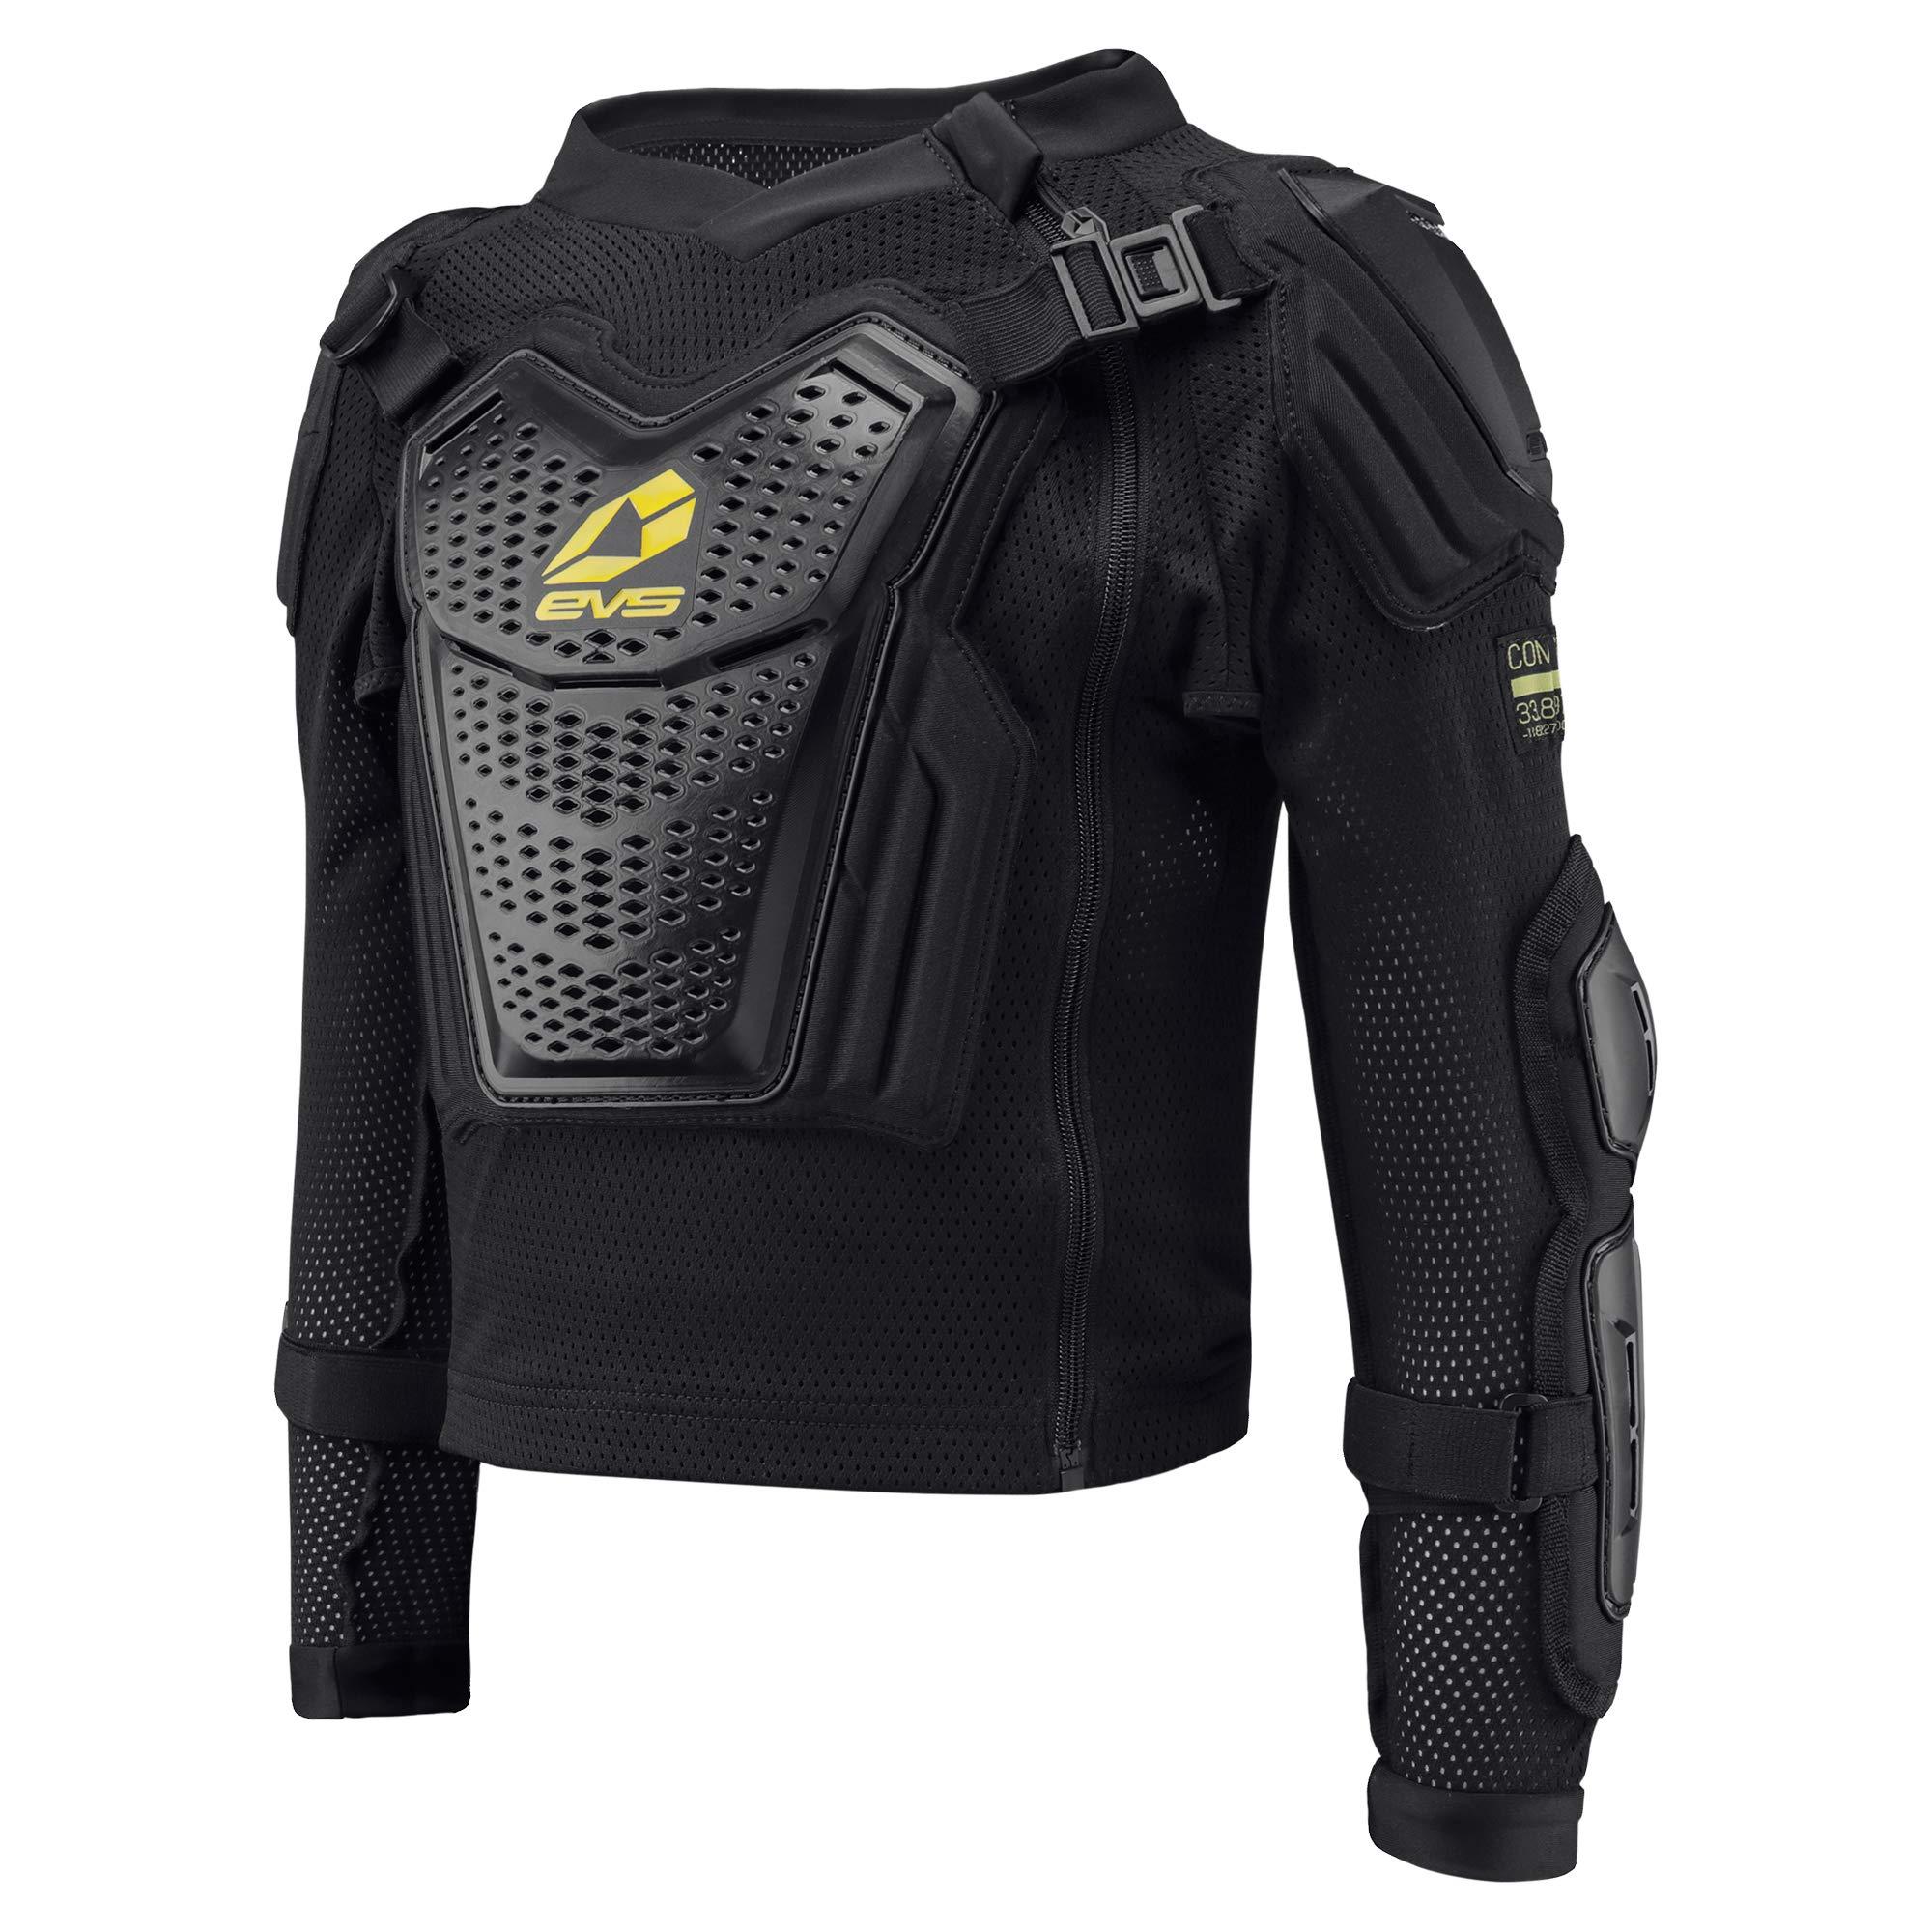 EVS Sports Boy's Youth Comp Suit (Black, Large